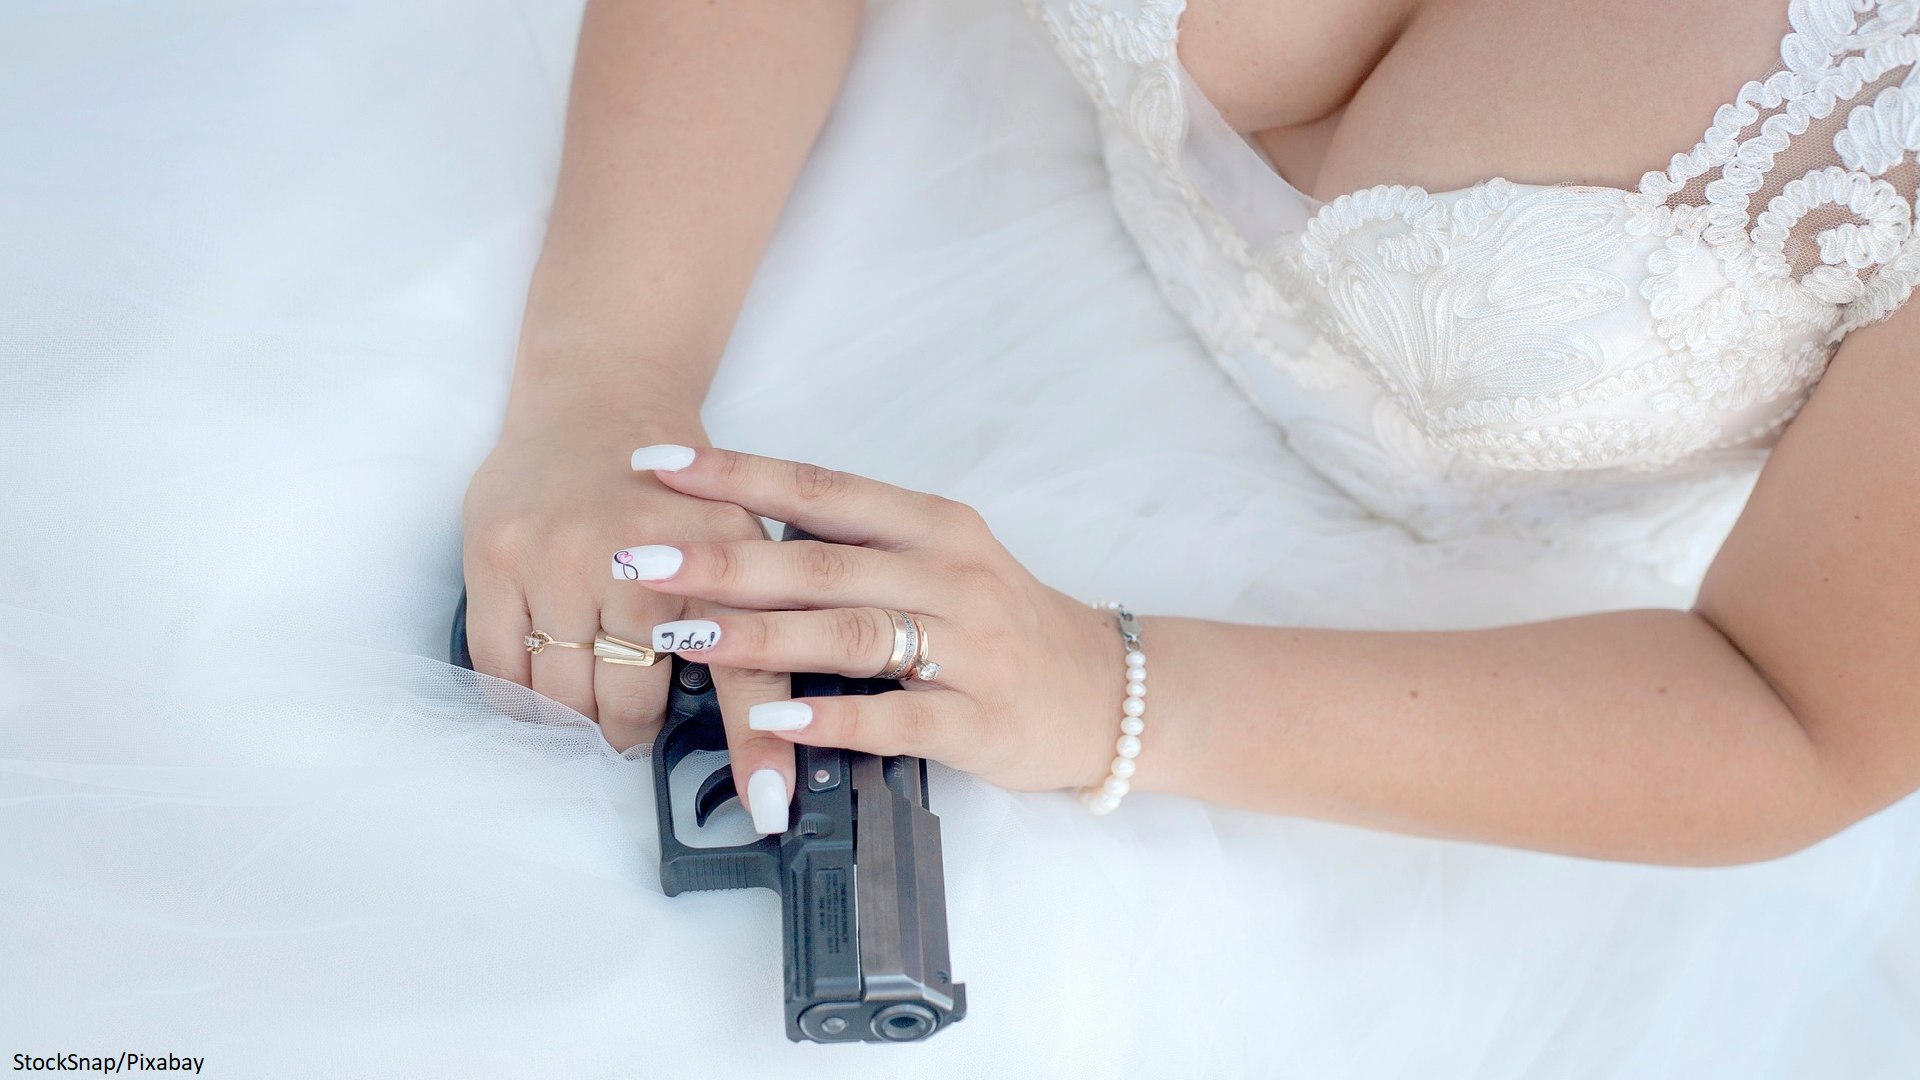 woman with gun dress.png